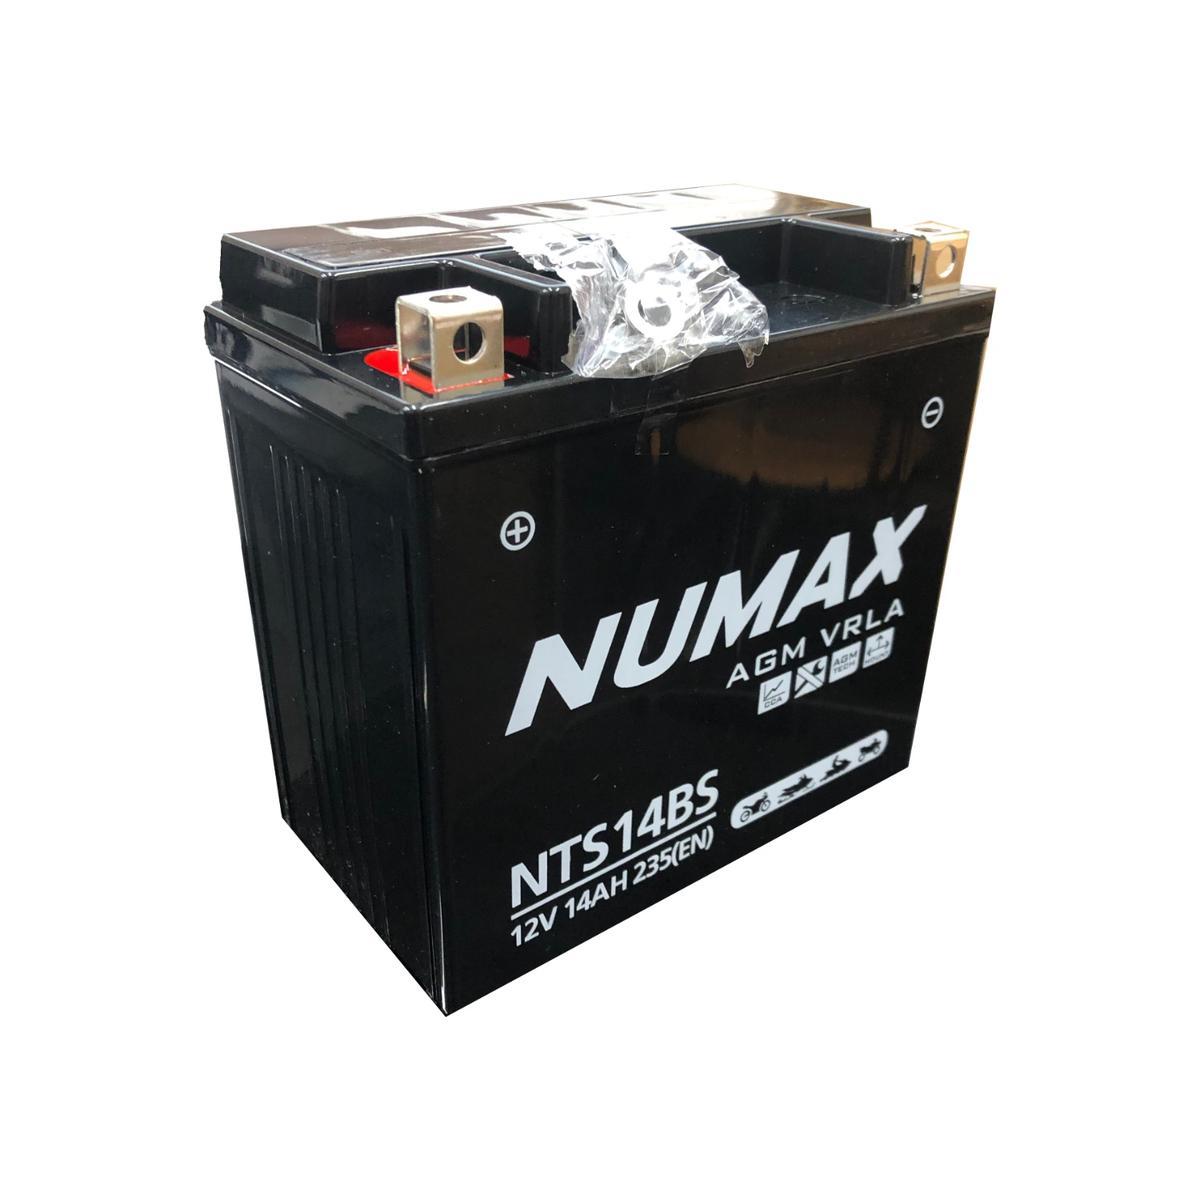 Numax NTS14BS 12v Motorbike Bike Battery HONDA 1300cc YTC1300s Retro YTX14-4